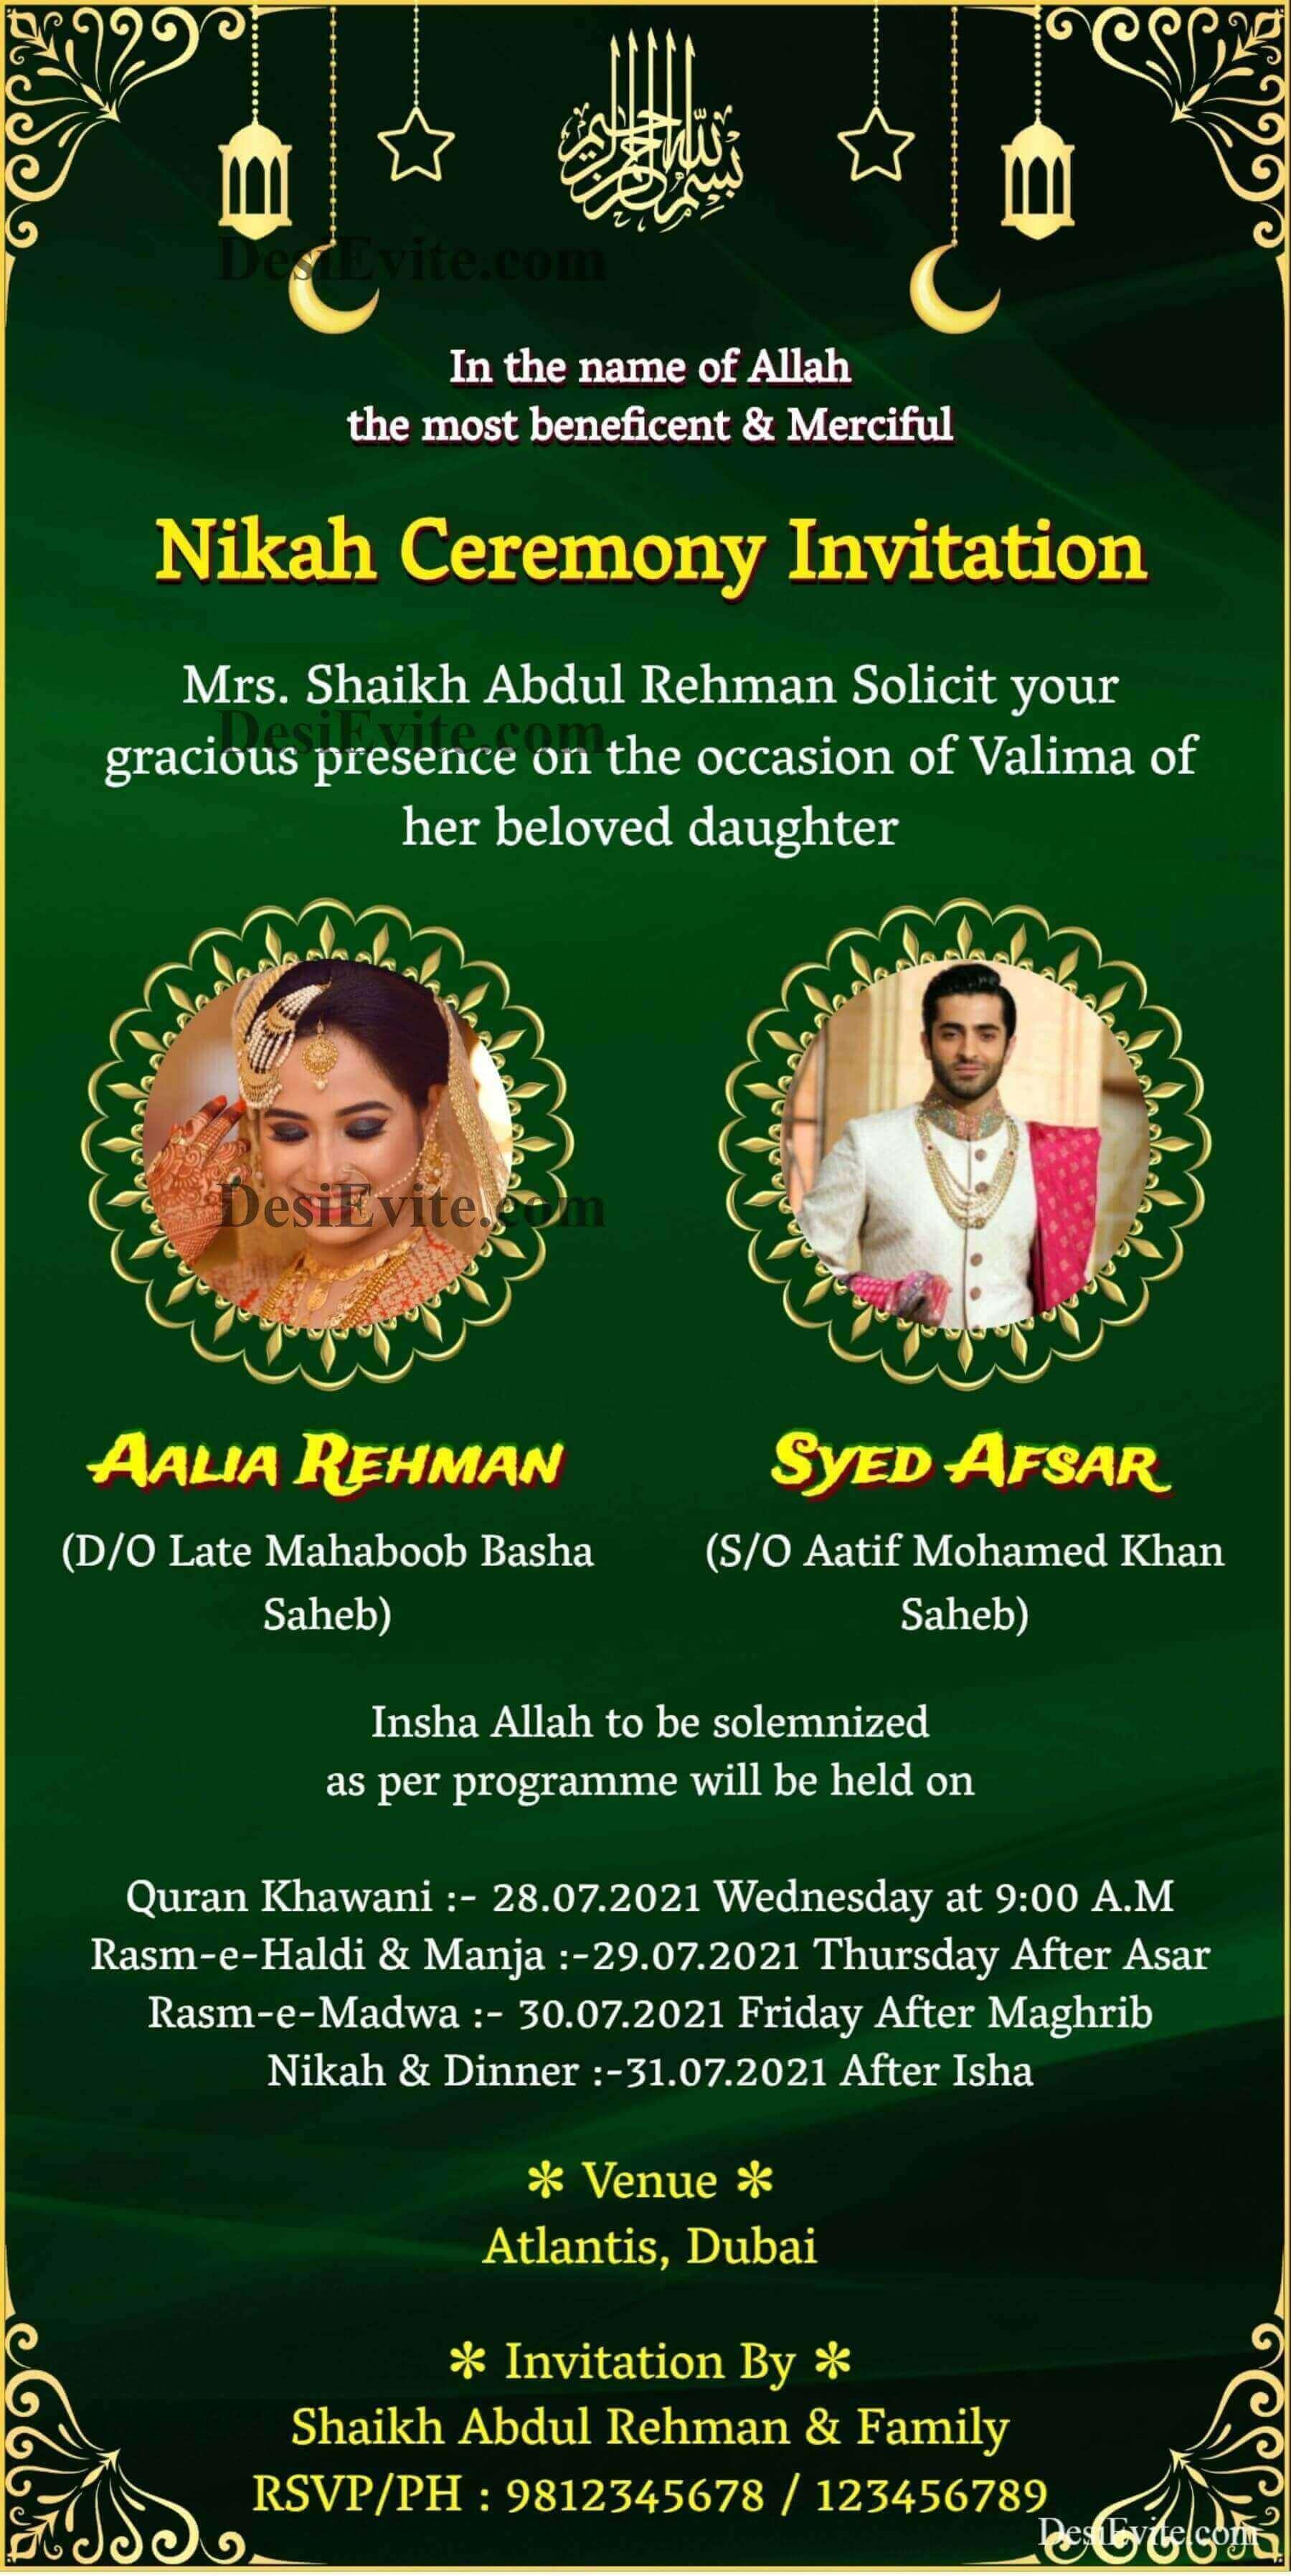 nikah-ceremony-ecard-with-groom-bride-photo